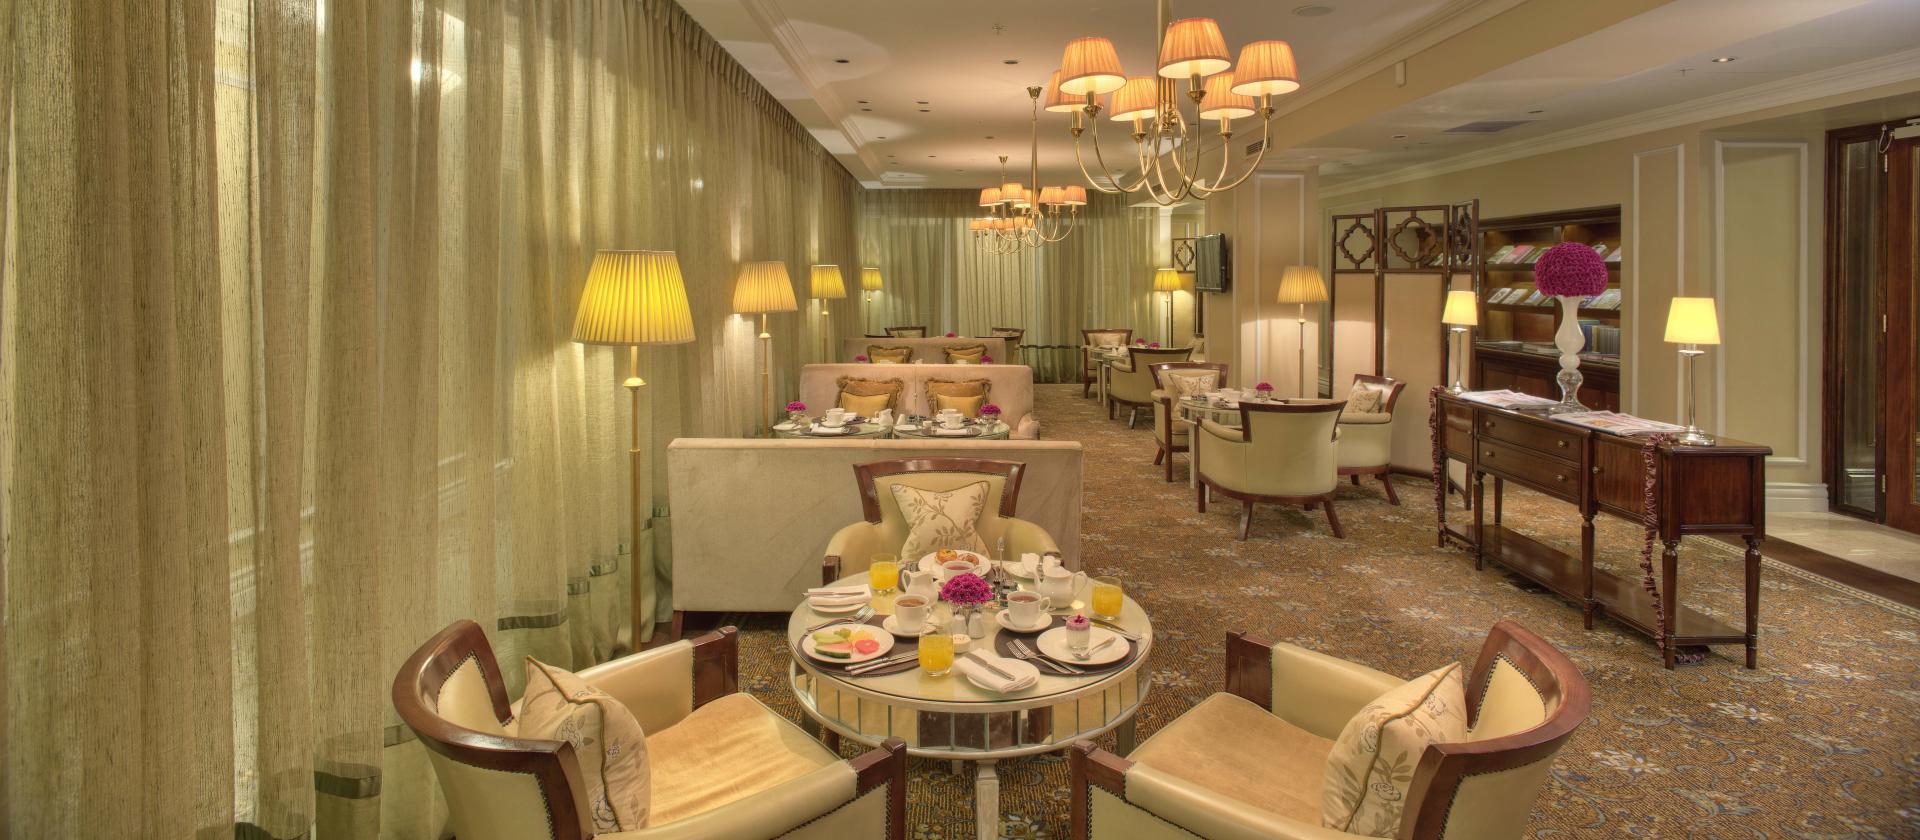 Complementary Taj Club Access, Taj Cape Town, Centre, Cape Town - Citybase Apartments